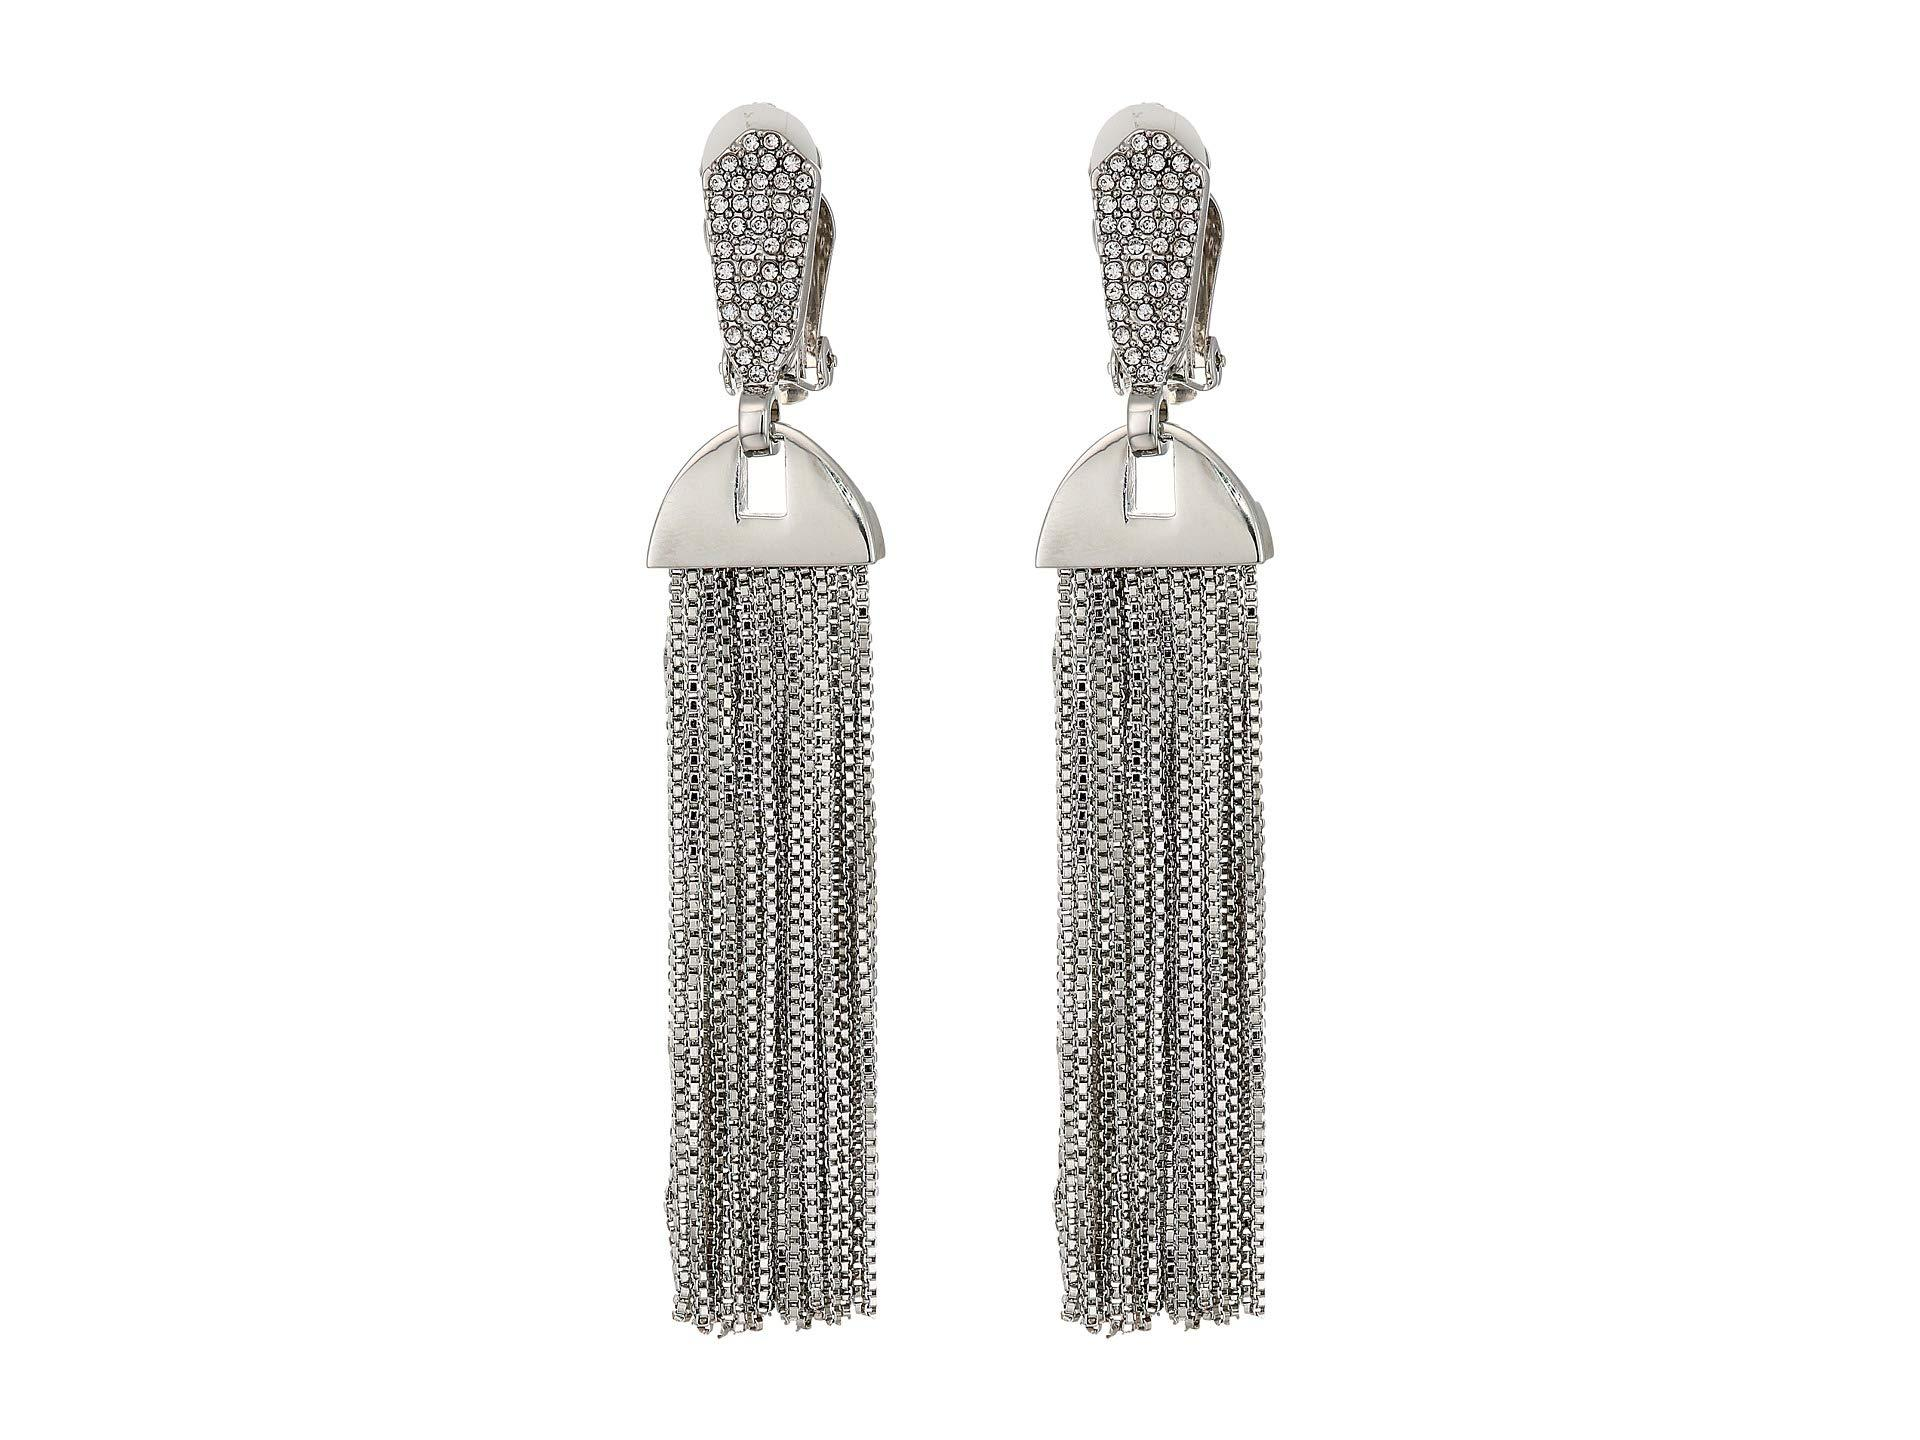 2ac0824d9 Lyst - Vince Camuto Pave Tassel Earrings (rhodium/crystal) Earring